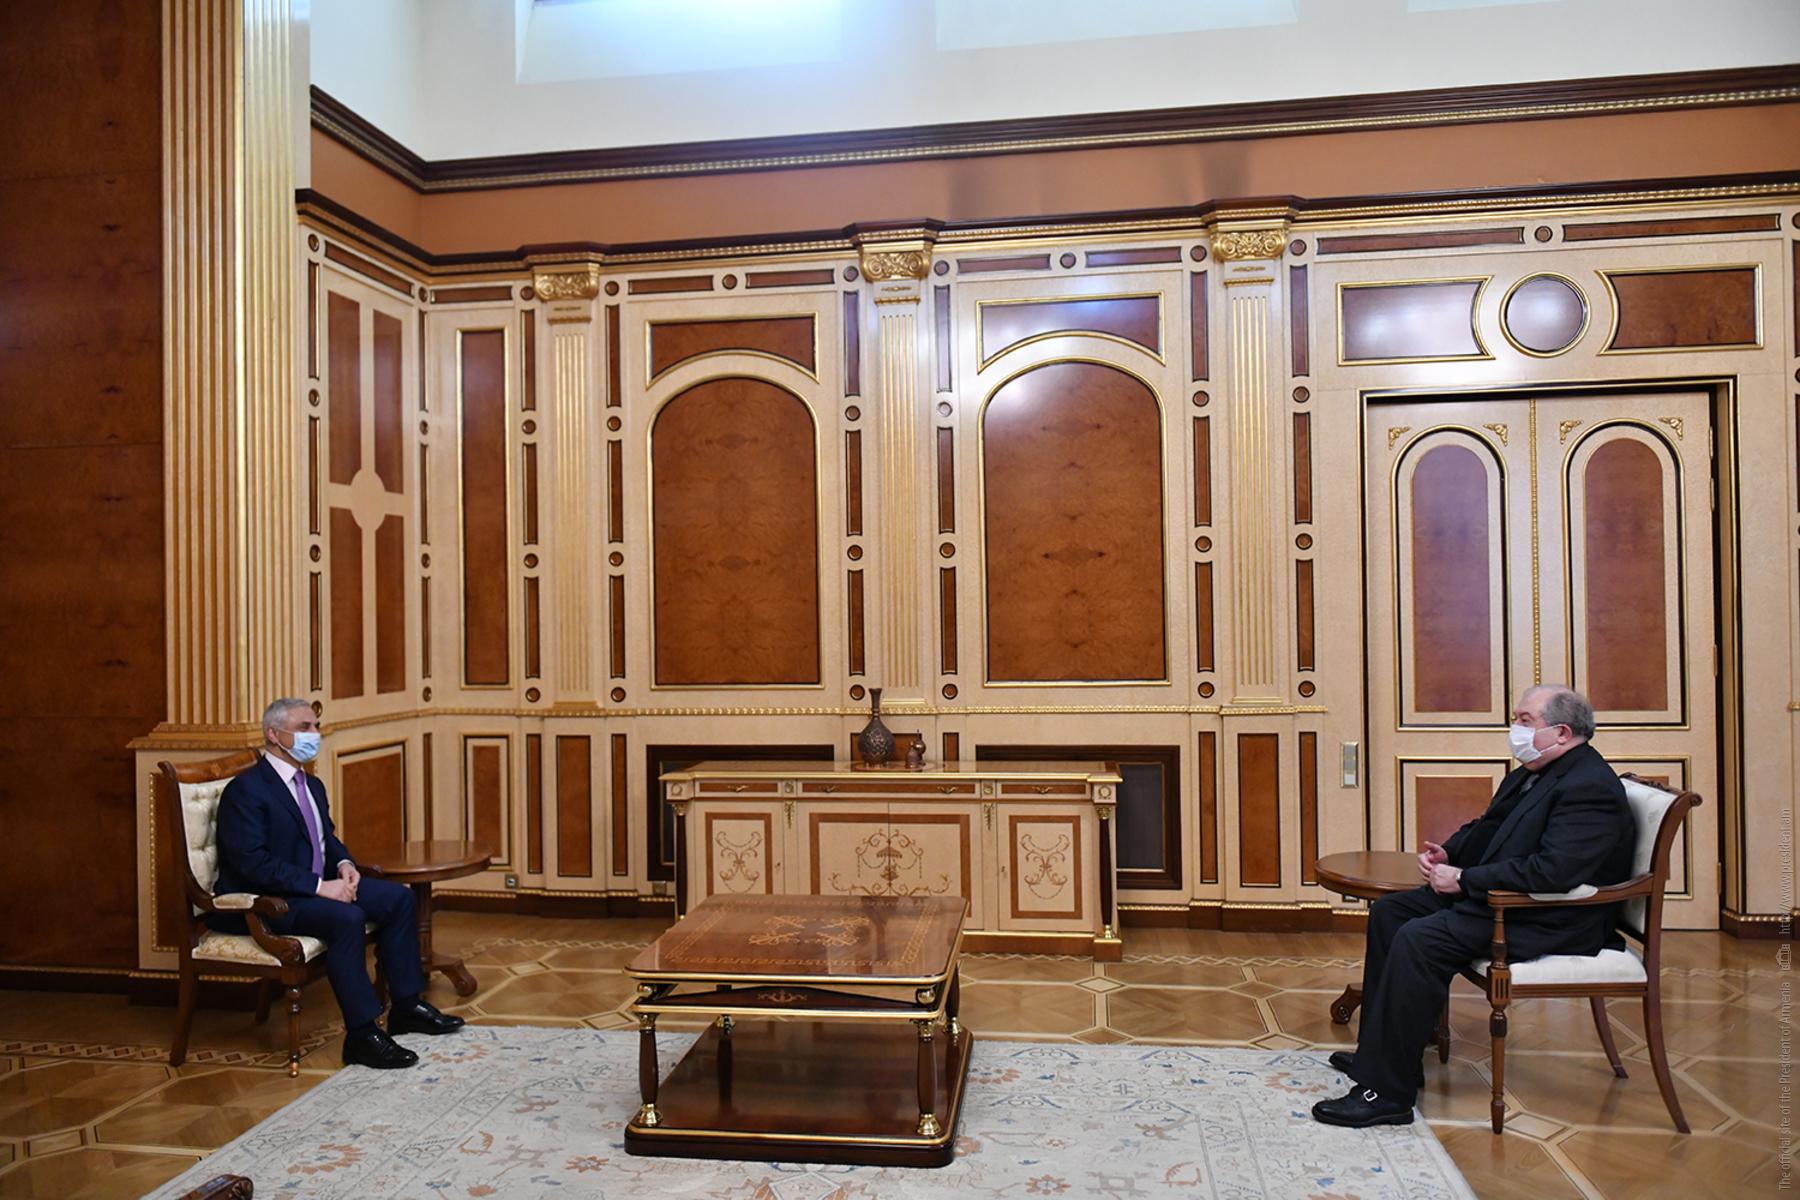 Photo of Արմեն Սարգսյանը հանդիպել է «Երրորդ ուժ» քաղաքացիական նախաձեռնության ներկայացուցիչ Արտակ Թովմասյանի հետ